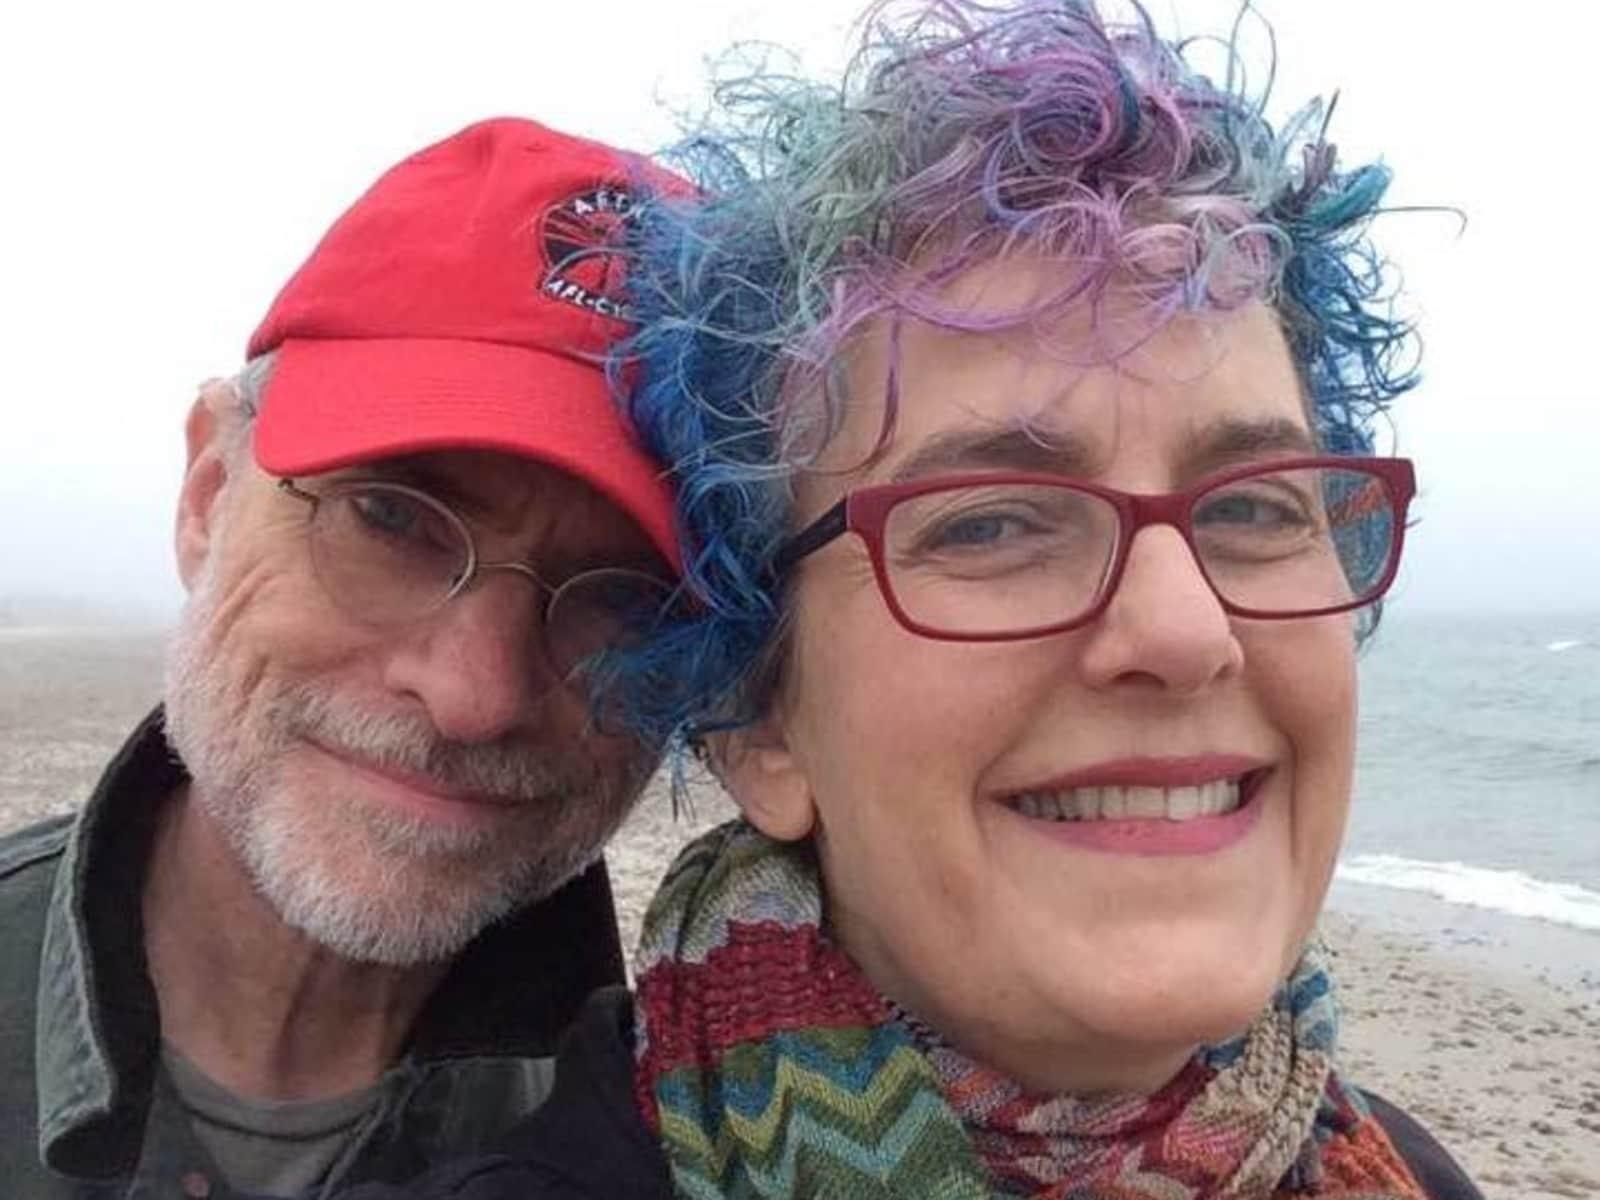 Alexandra & Peter from Washington, D.C., Washington, D.C., United States